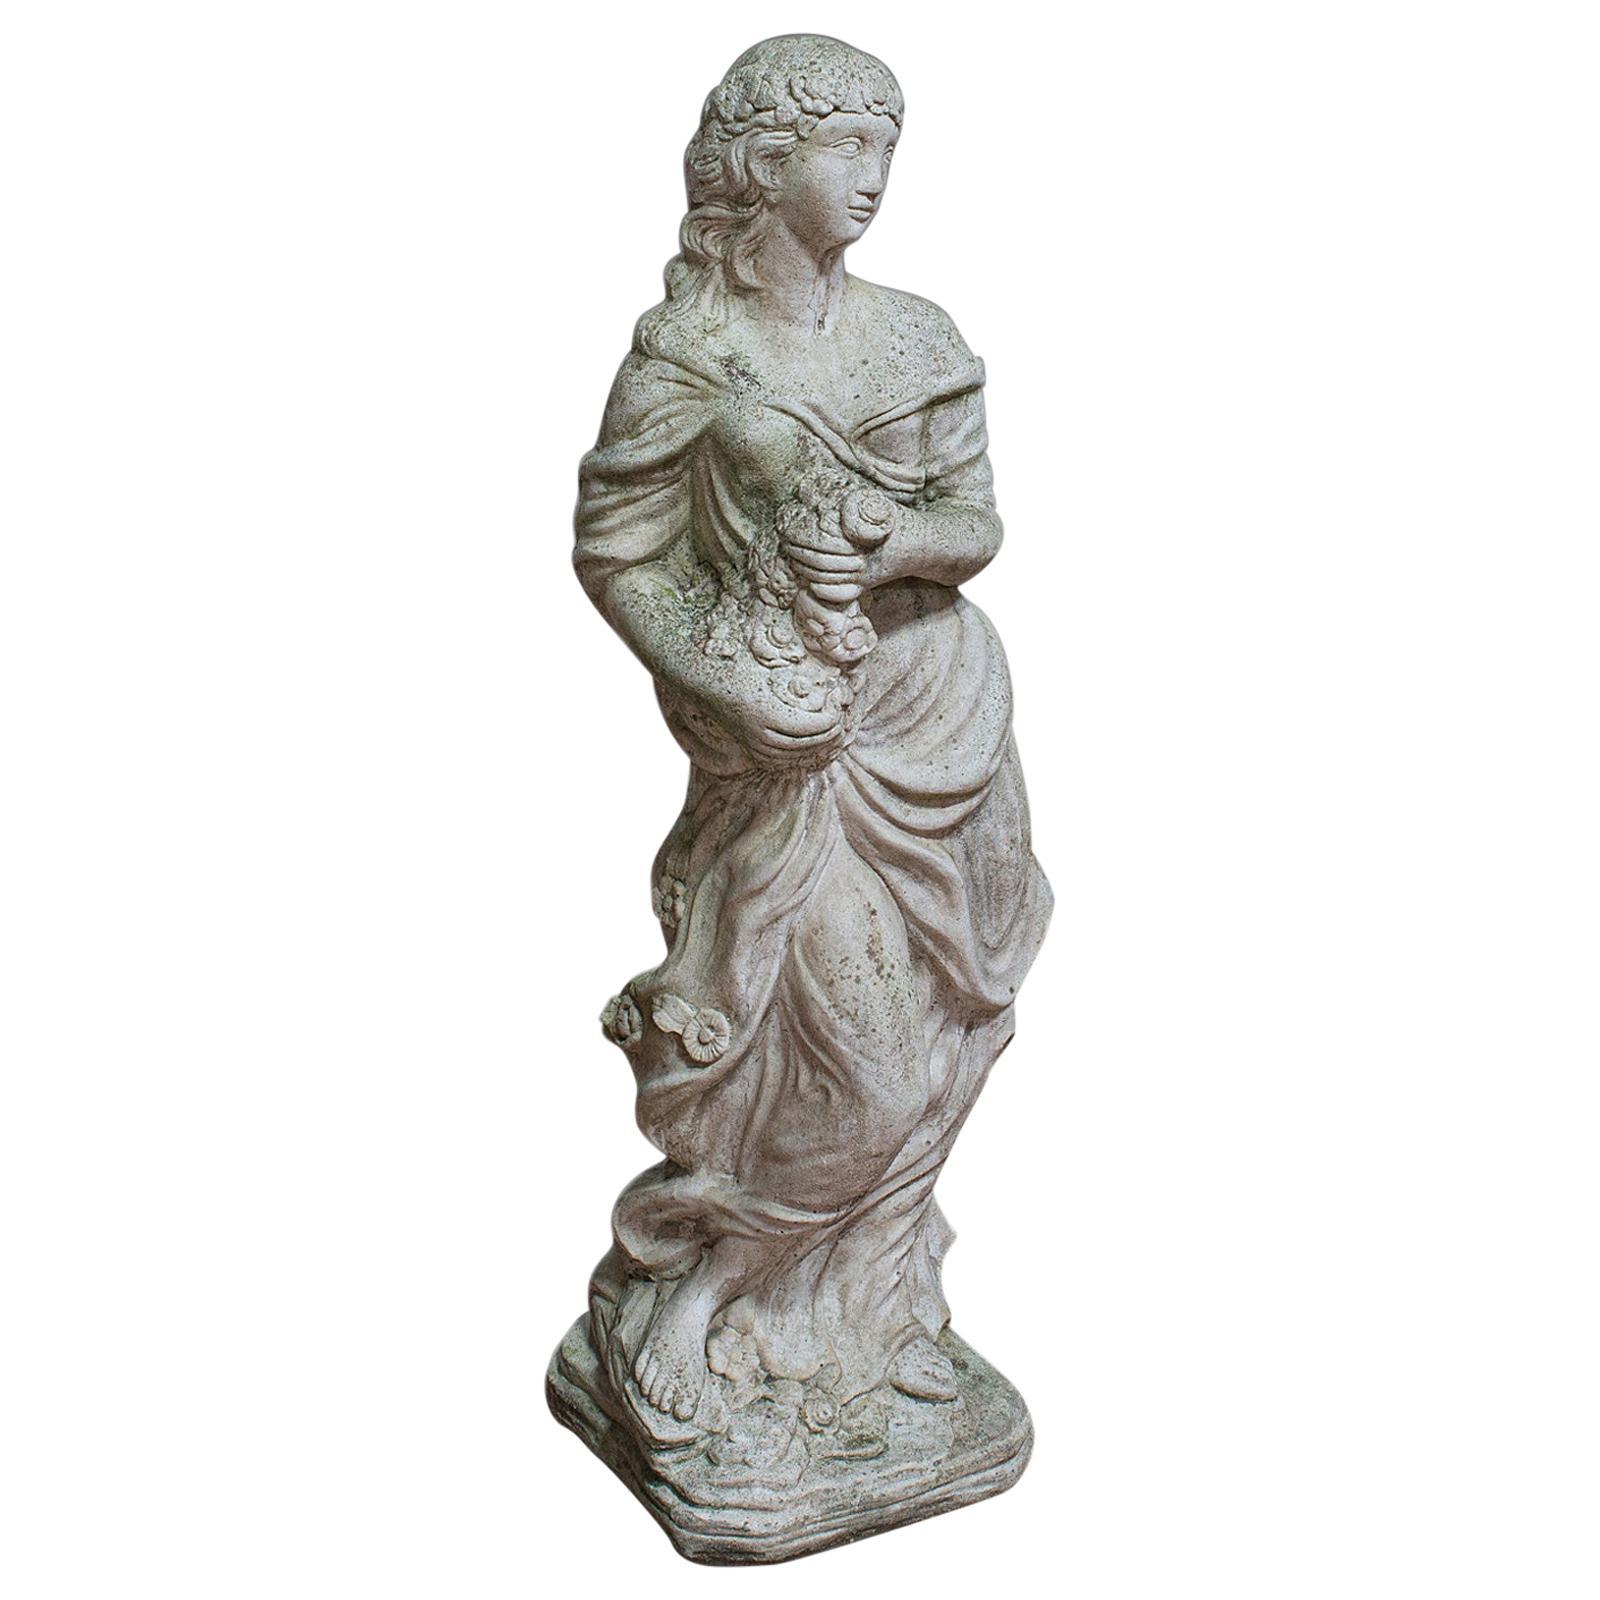 Vintage Female Statue, Reconstituted Stone, Garden, Ornament, circa 1950